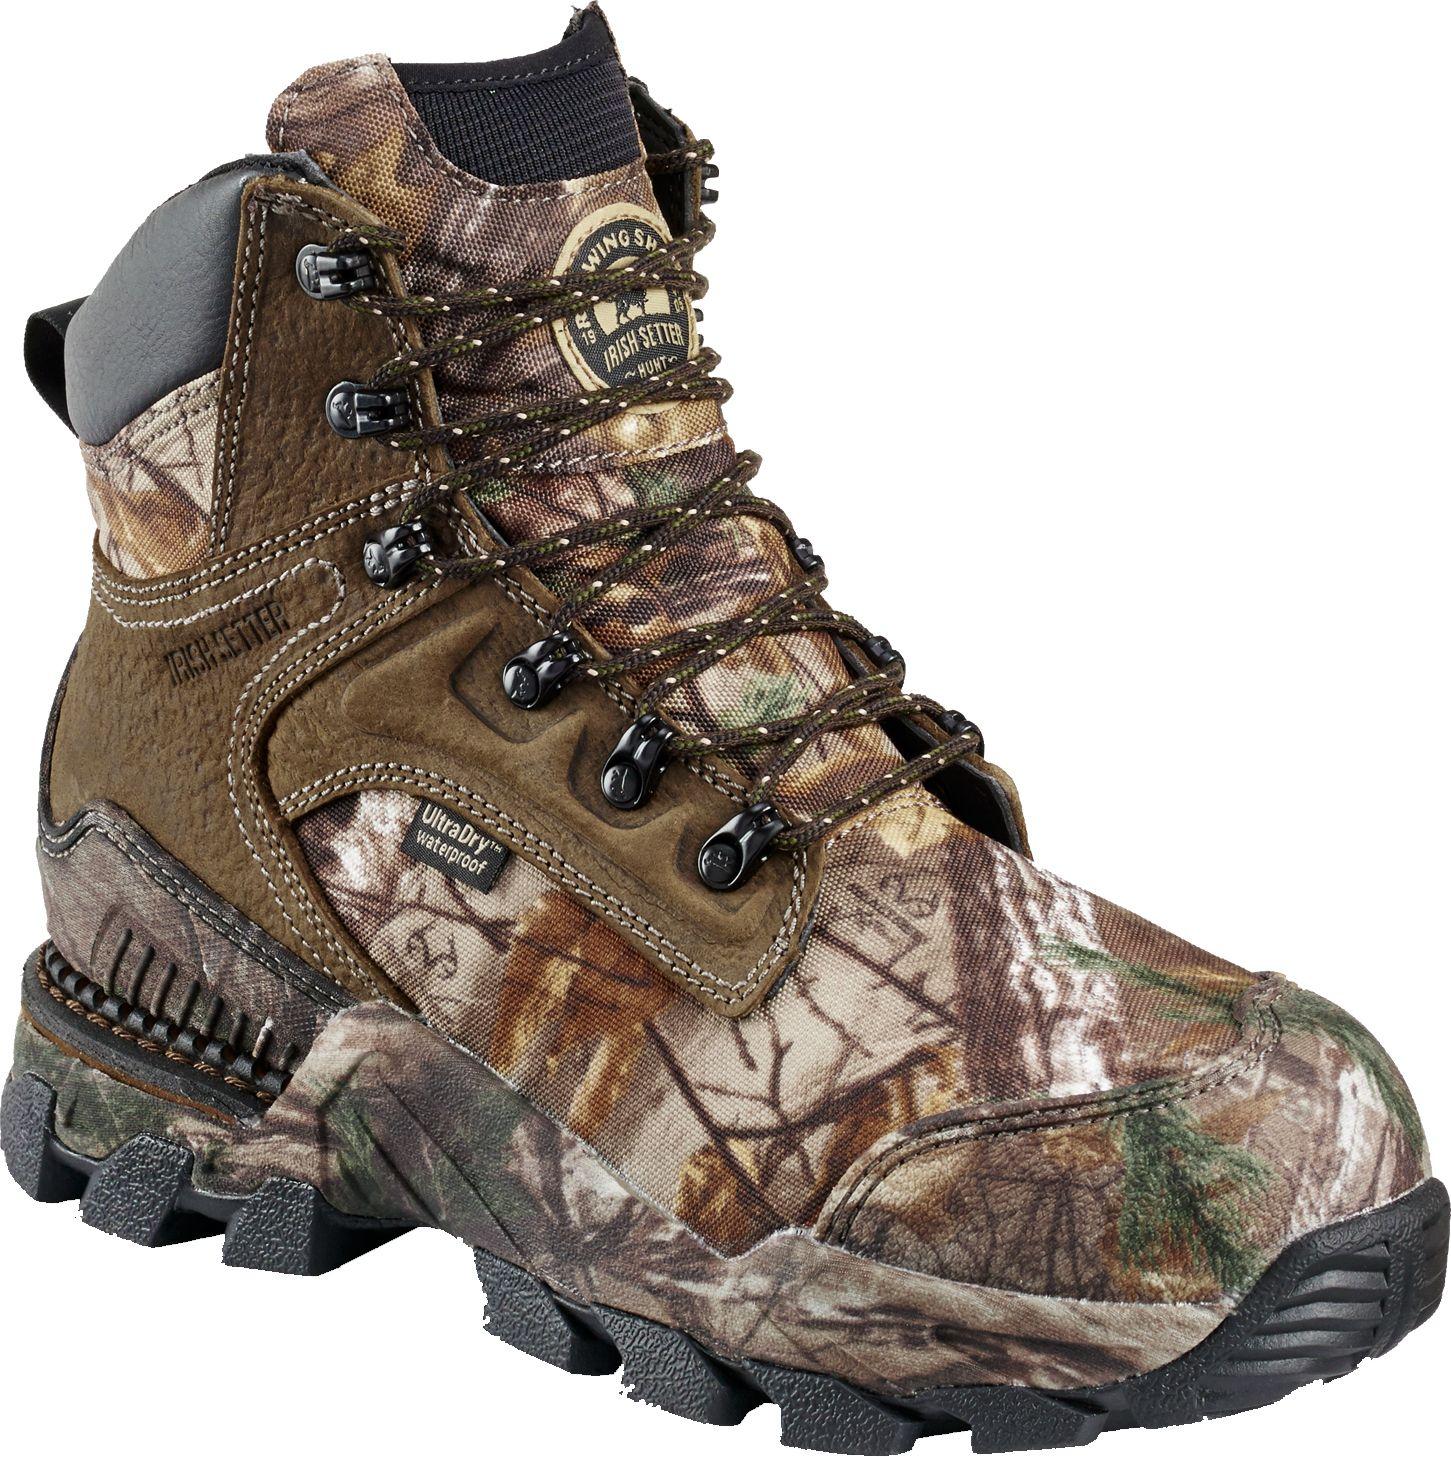 Irish Setter Men's Deer Tracker Hunting Boots, Size: 8.5, Realtree Xtra thumbnail